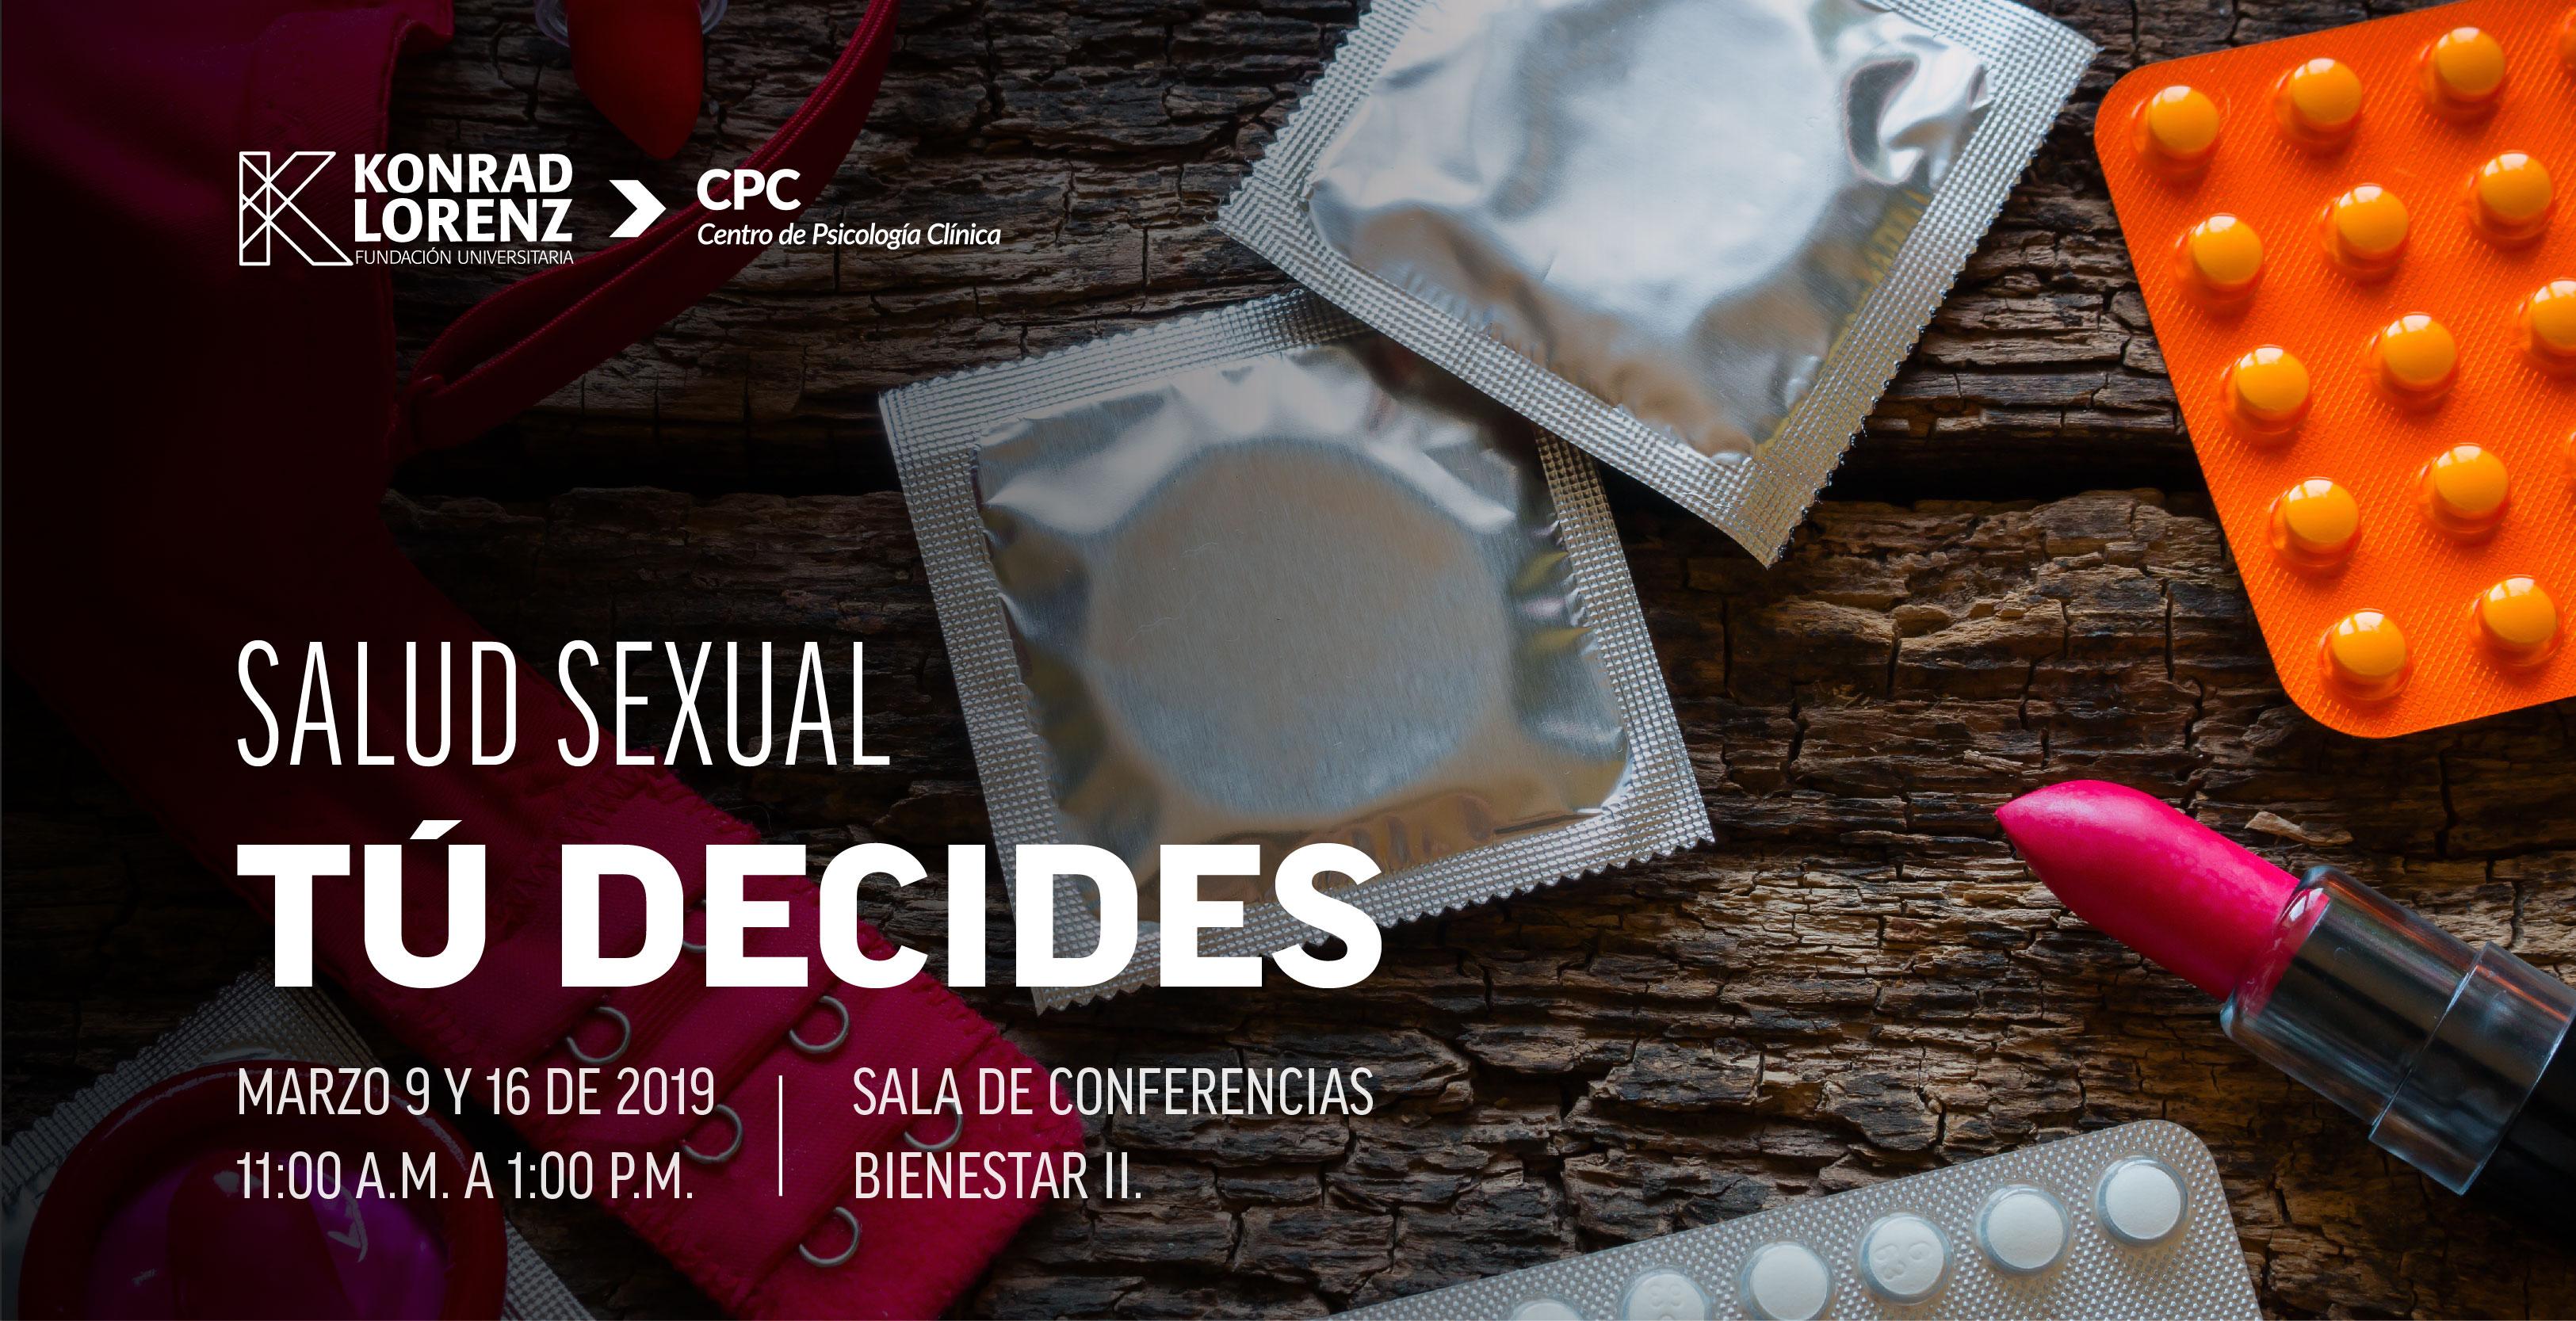 Salud sexual: Tú decides